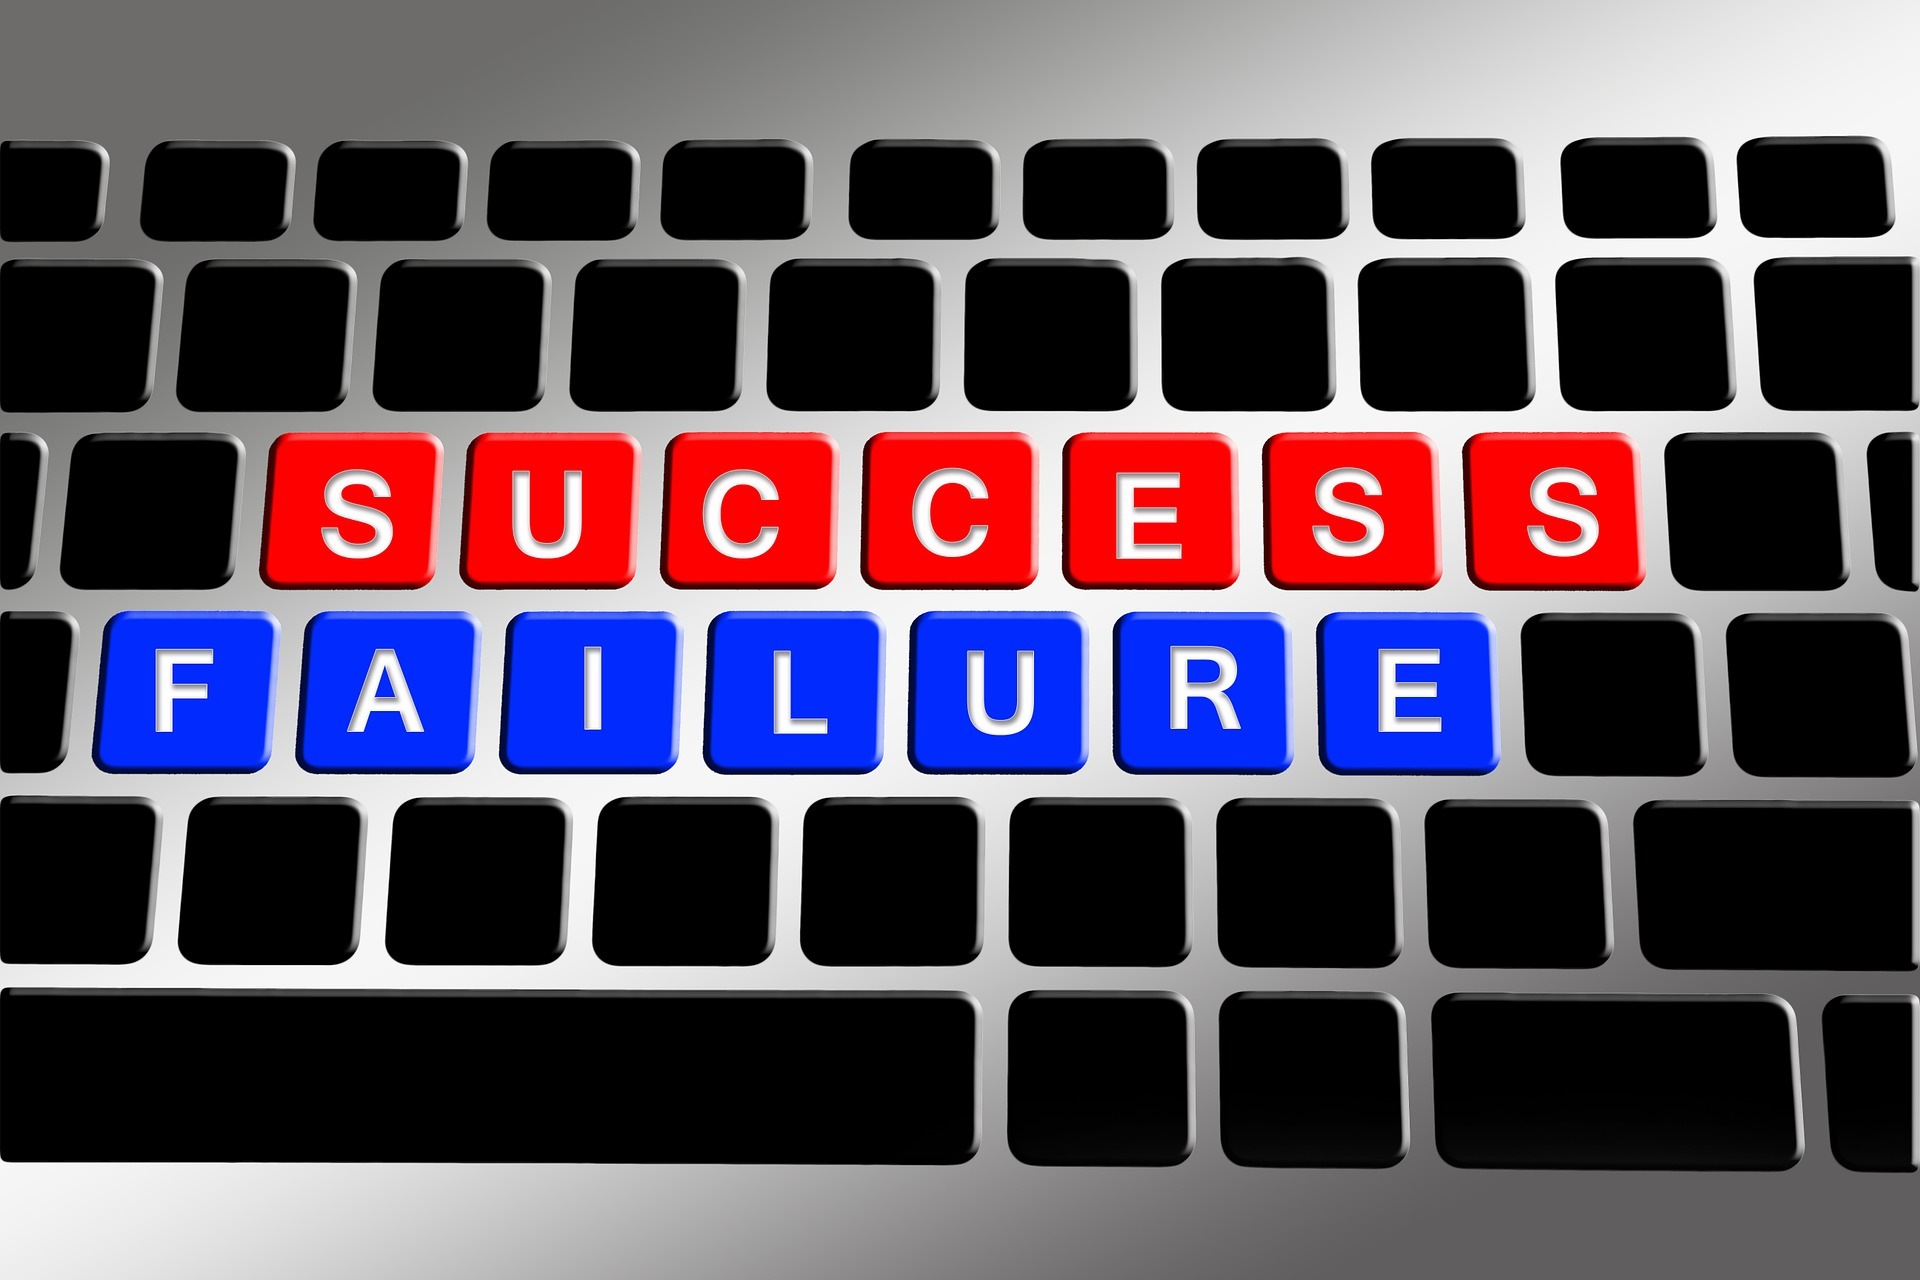 The price of avoiding failure is eternal vigilance